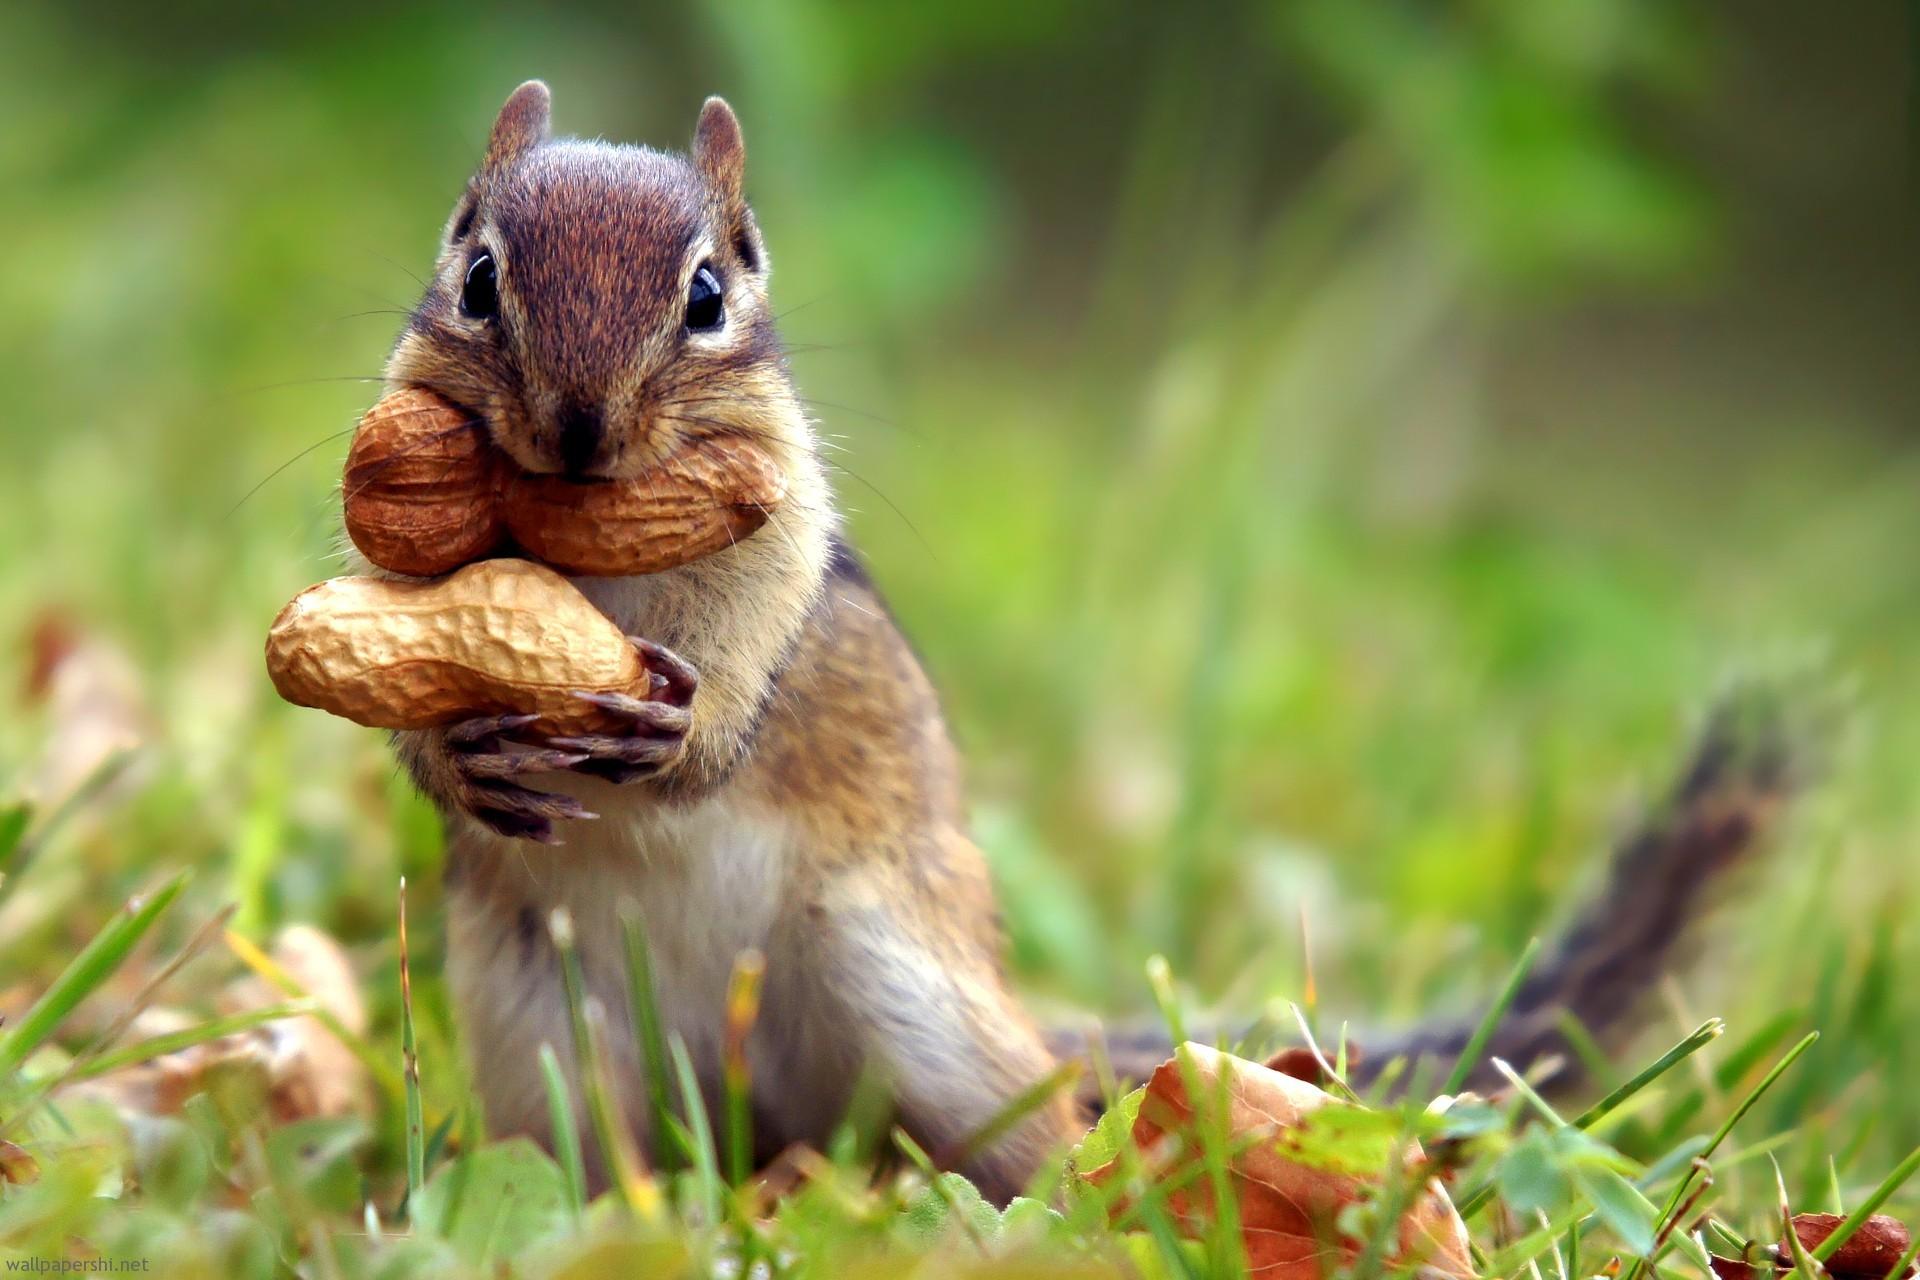 … squirrel-nut-cute-animal-nature-grass-1920×1280